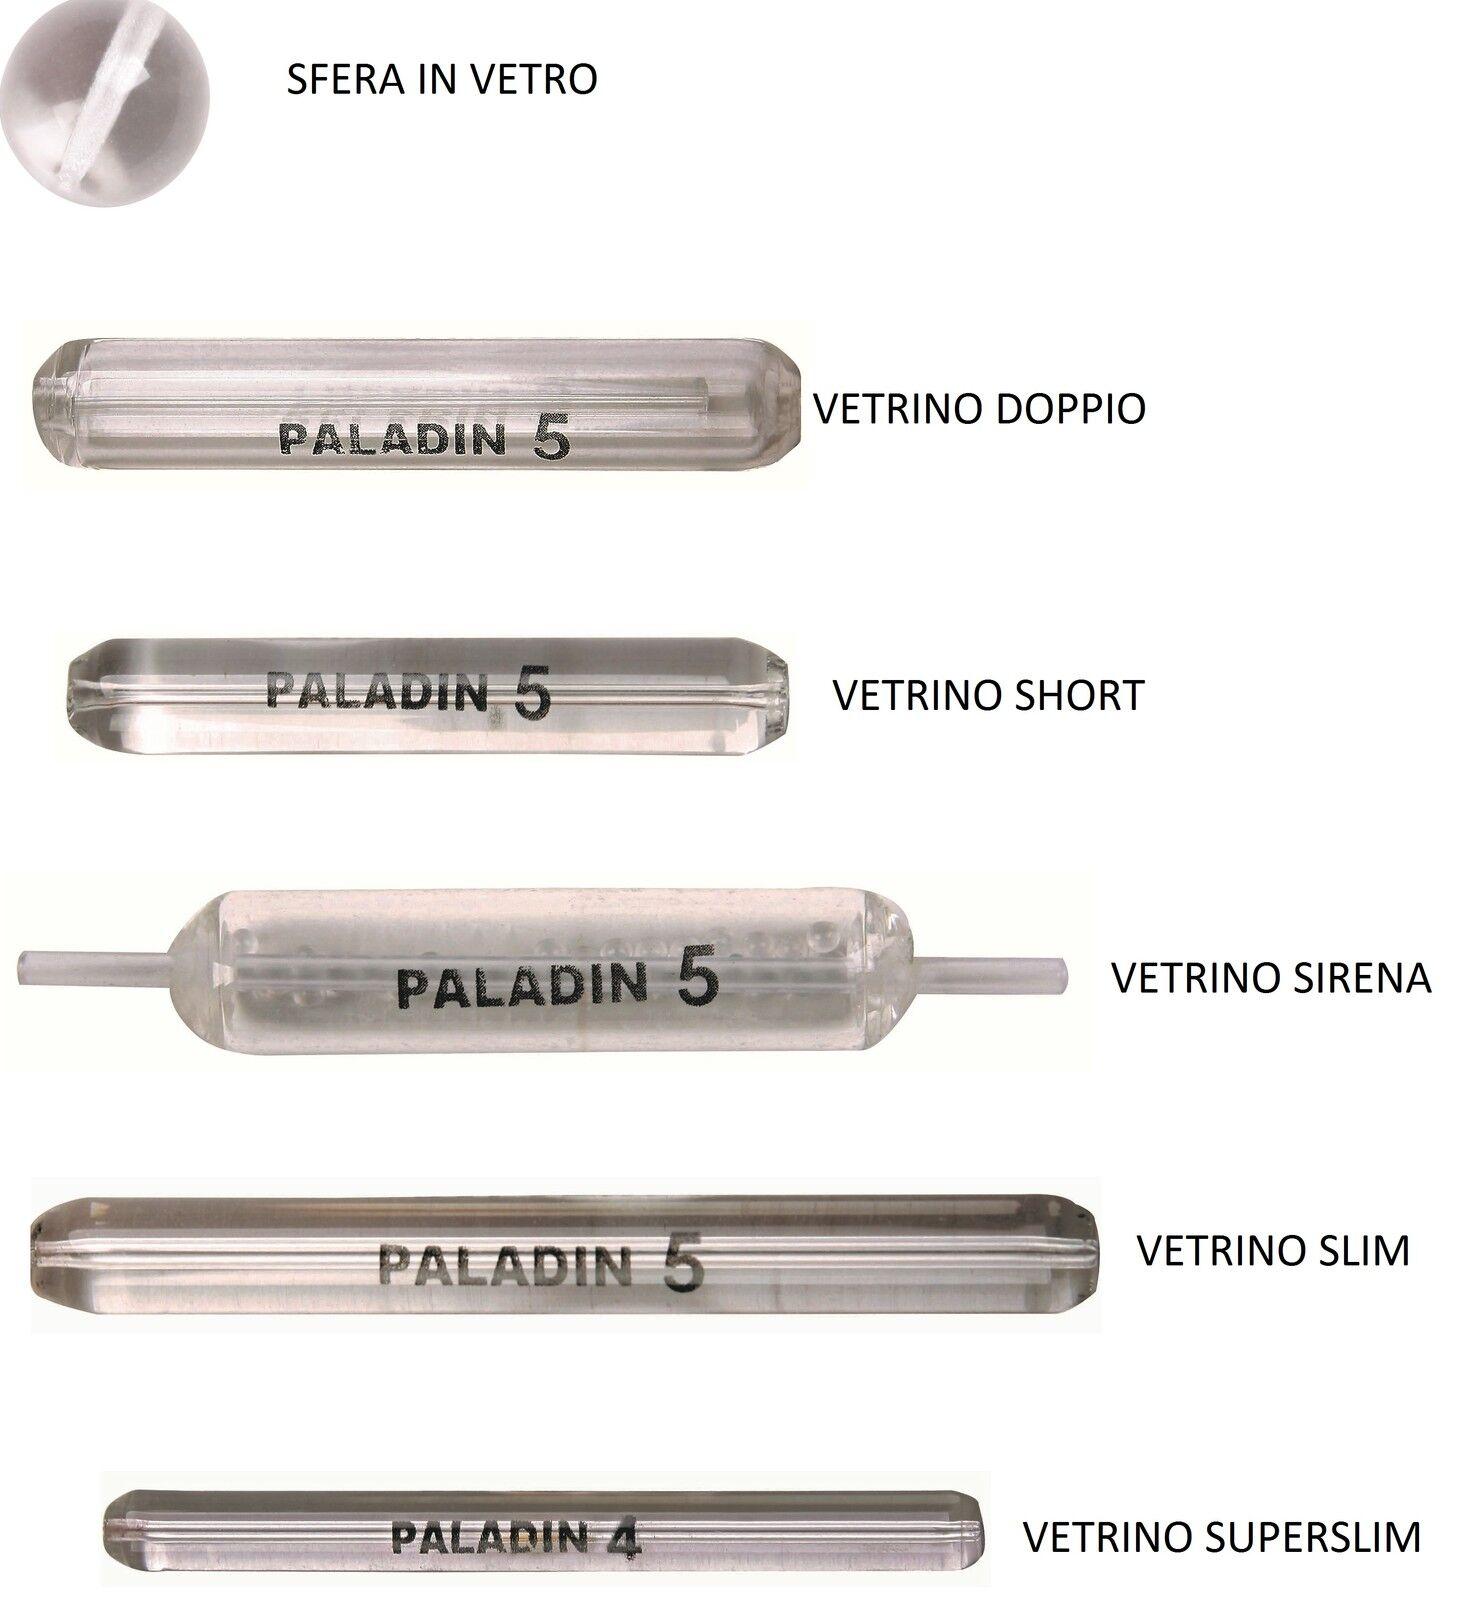 Paladin Vetrino Slim Glas Ventrinos zum Tremarella Angeln Glasgewicht